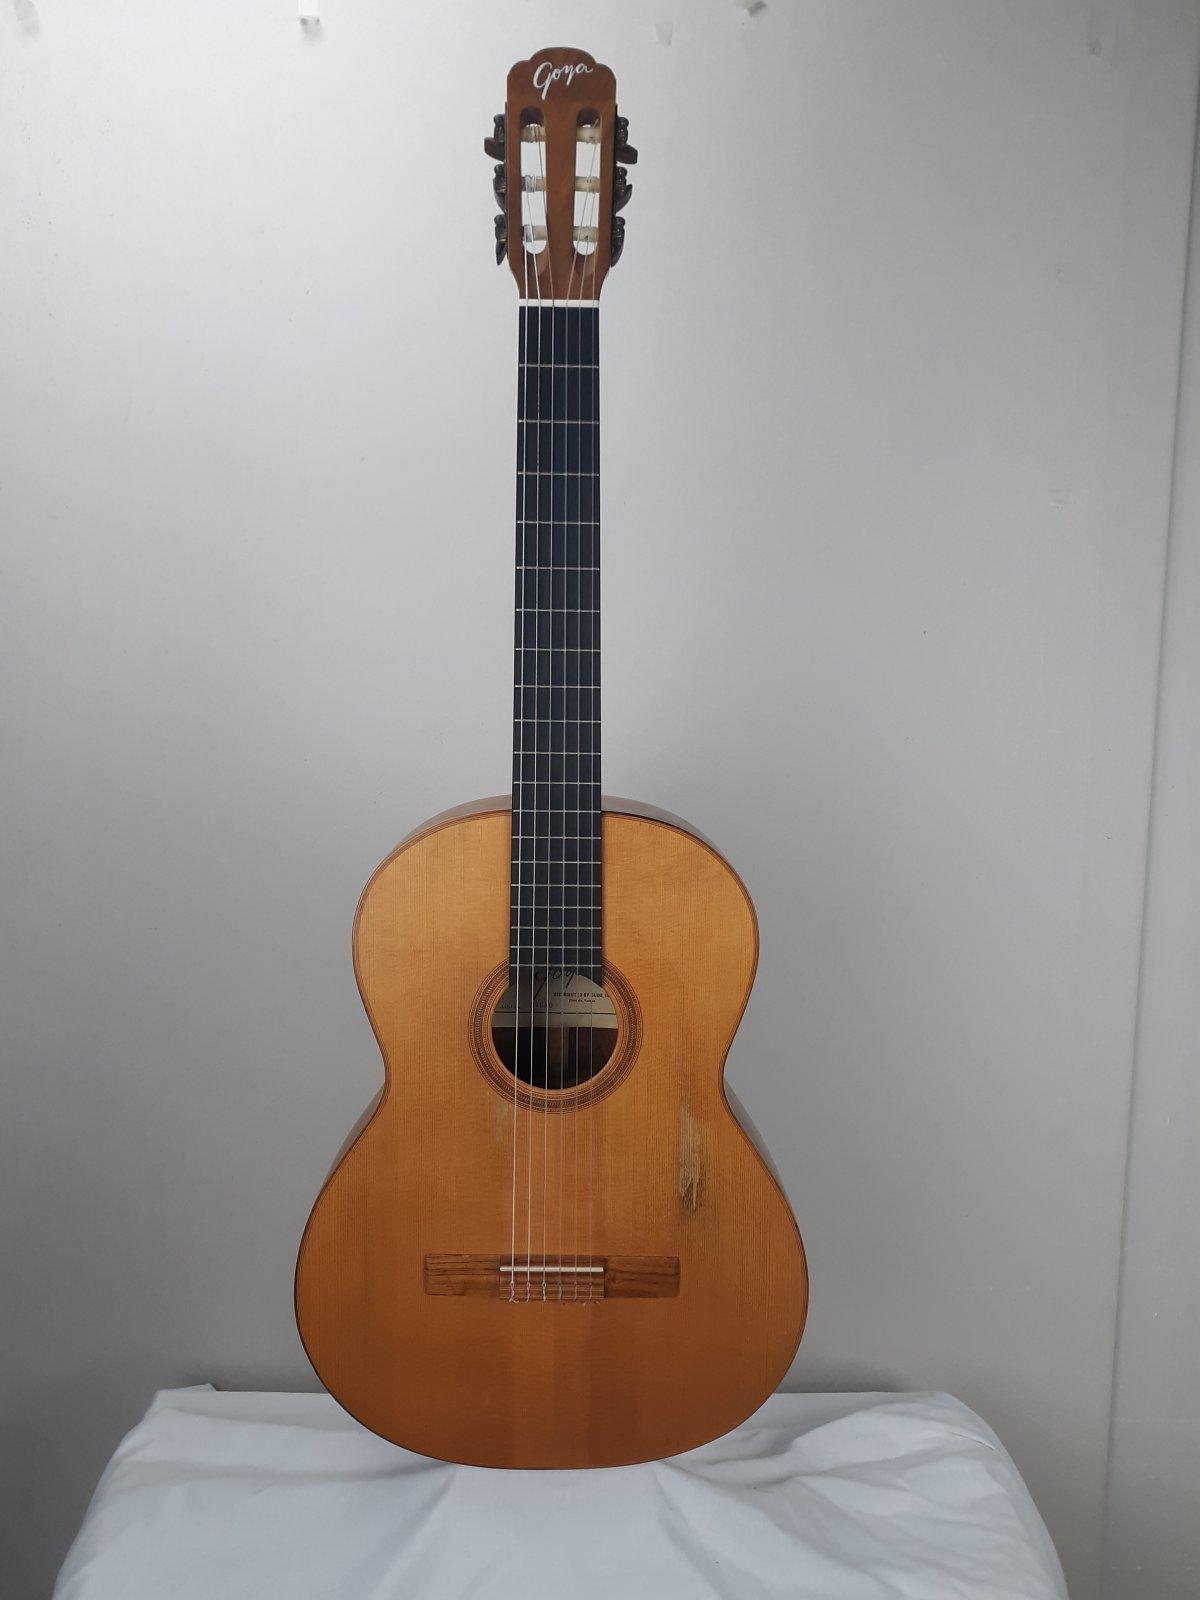 Goya Classical Guitar GG45 w/ Case - Consignment